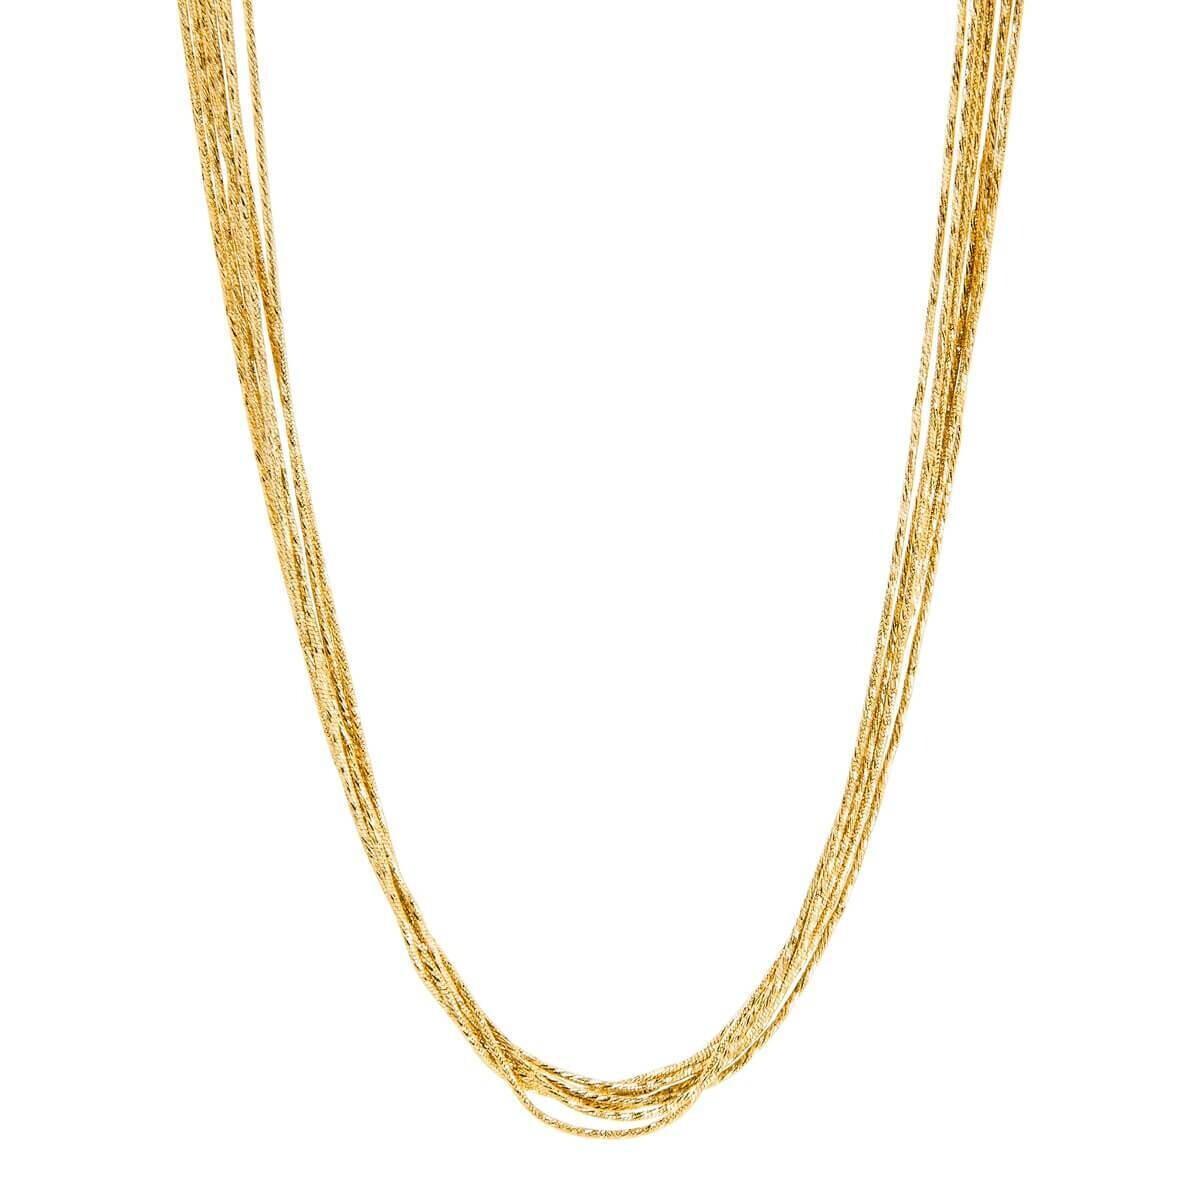 Najo - Como Multi-Strand Gold Necklace